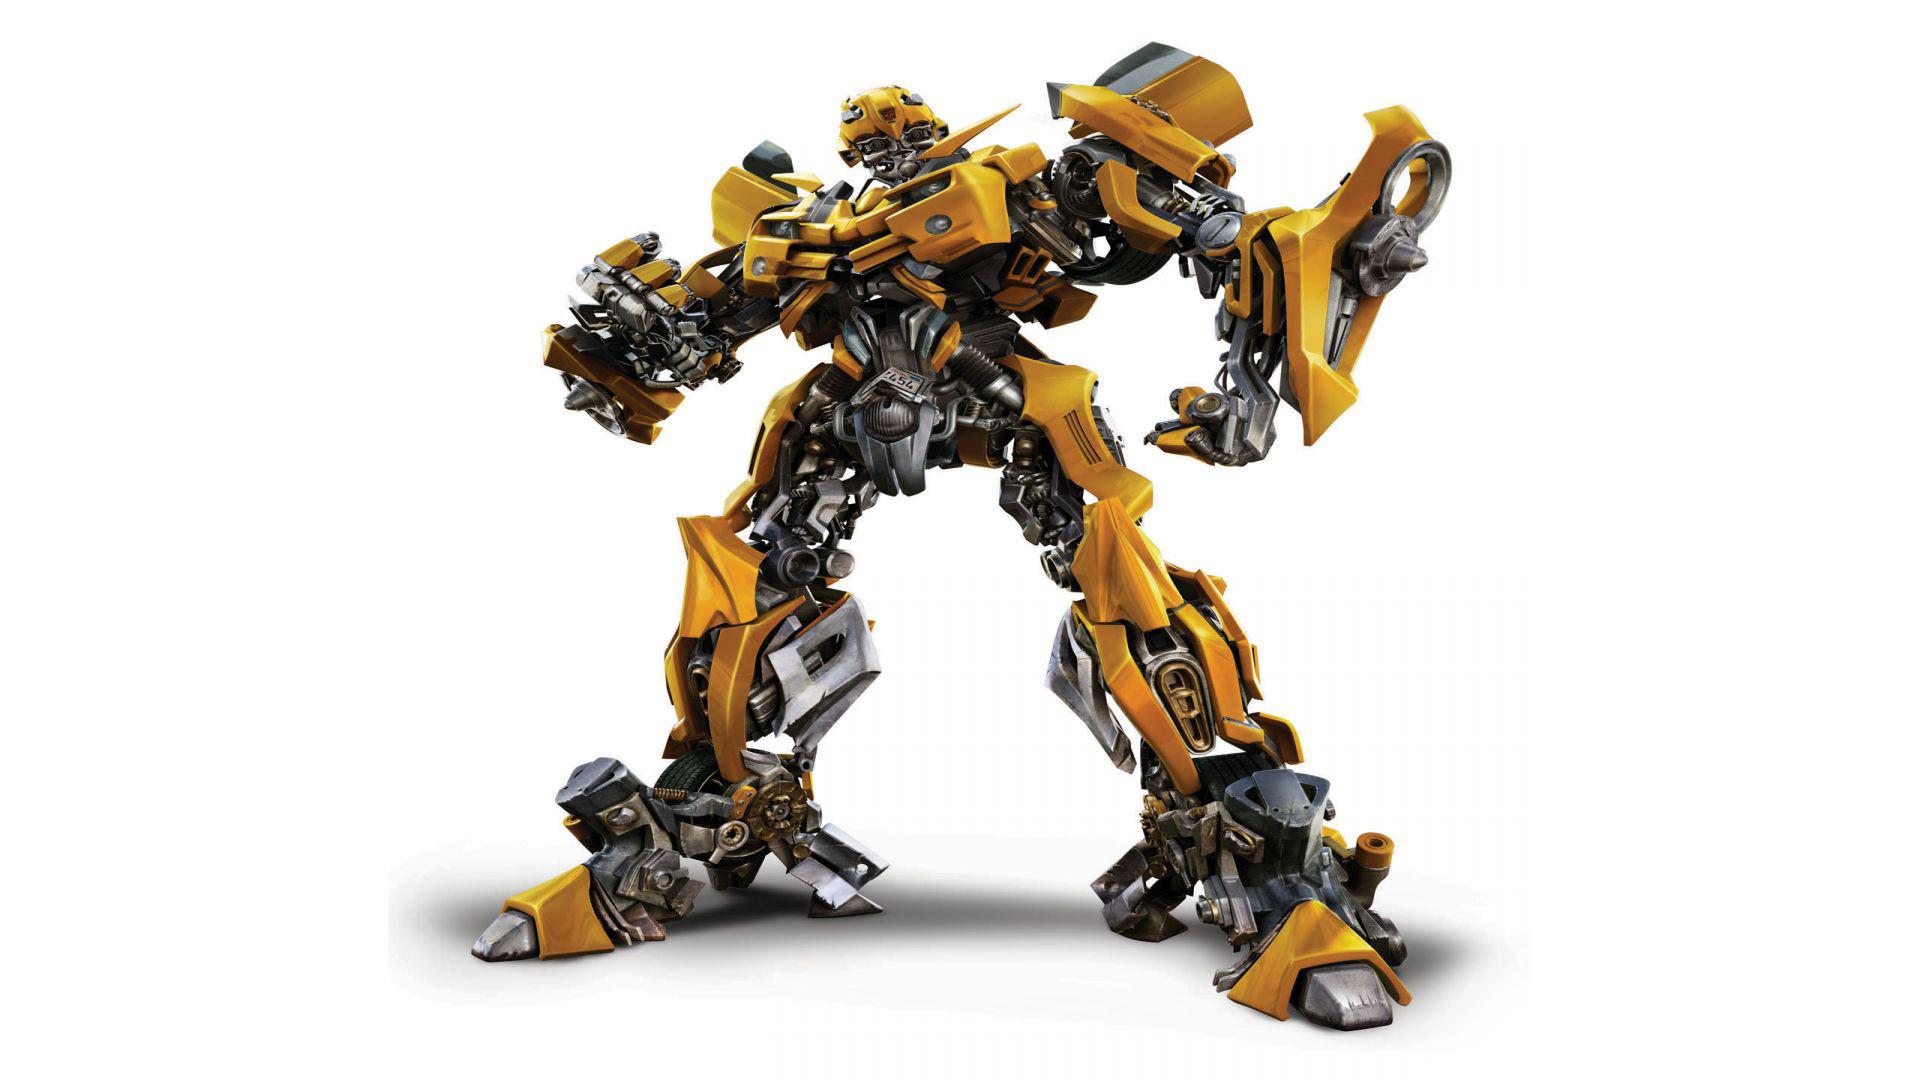 Res: 1920x1080, Bumblebee - Transformers wallpaper #8162